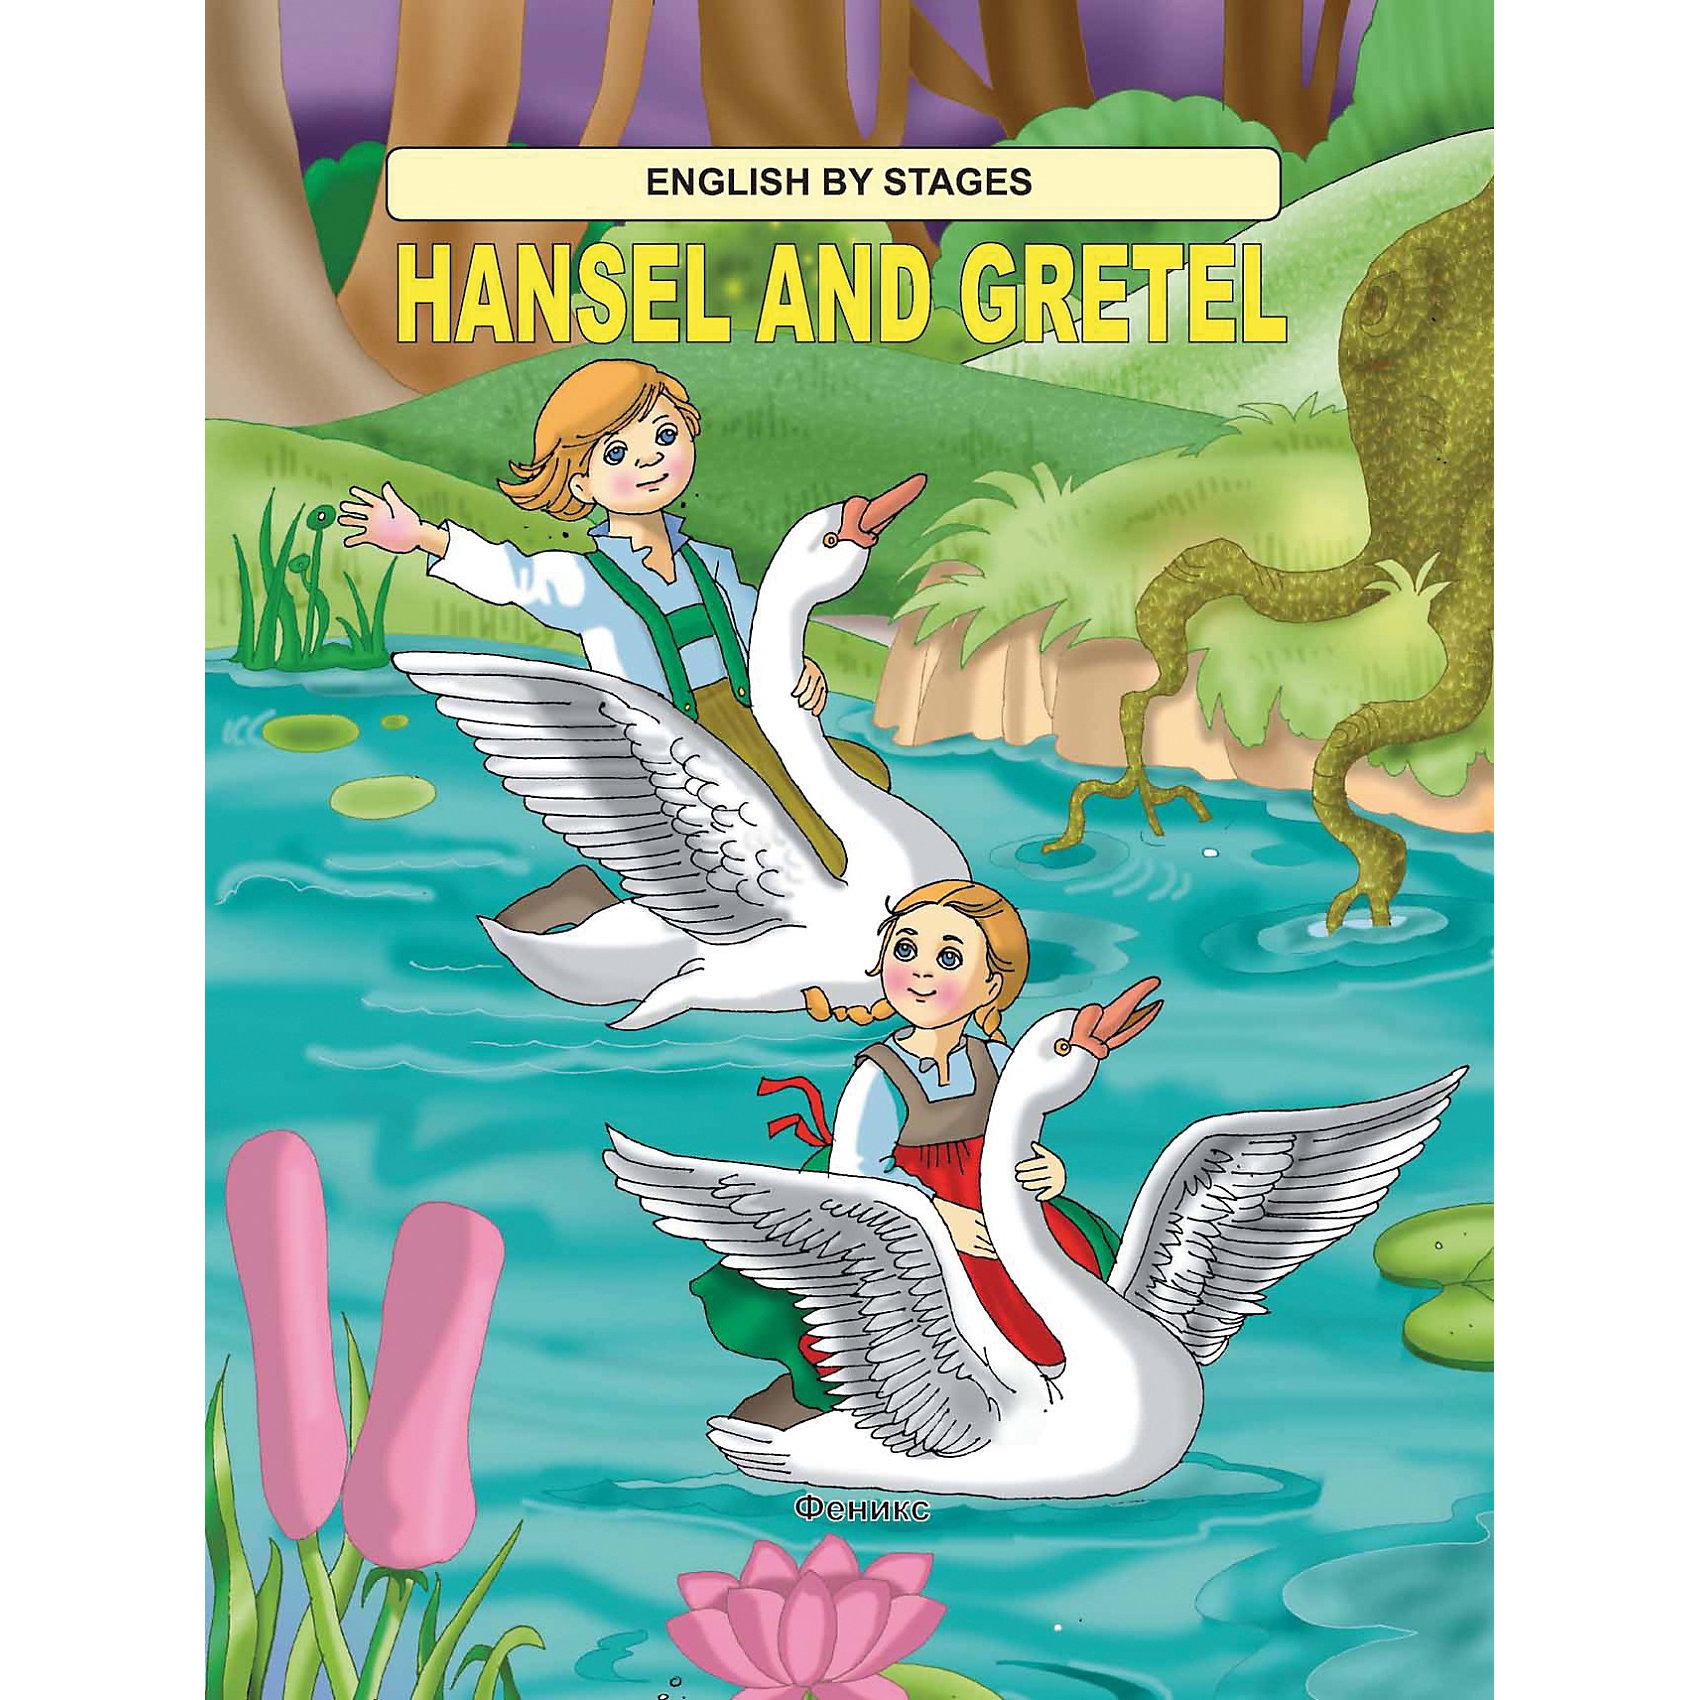 Fenix Сказка на английском Hansel and Gretel басё м танка жемчужные нити хокку лед на хризантемах рубаи комплект из трех книг в футляре